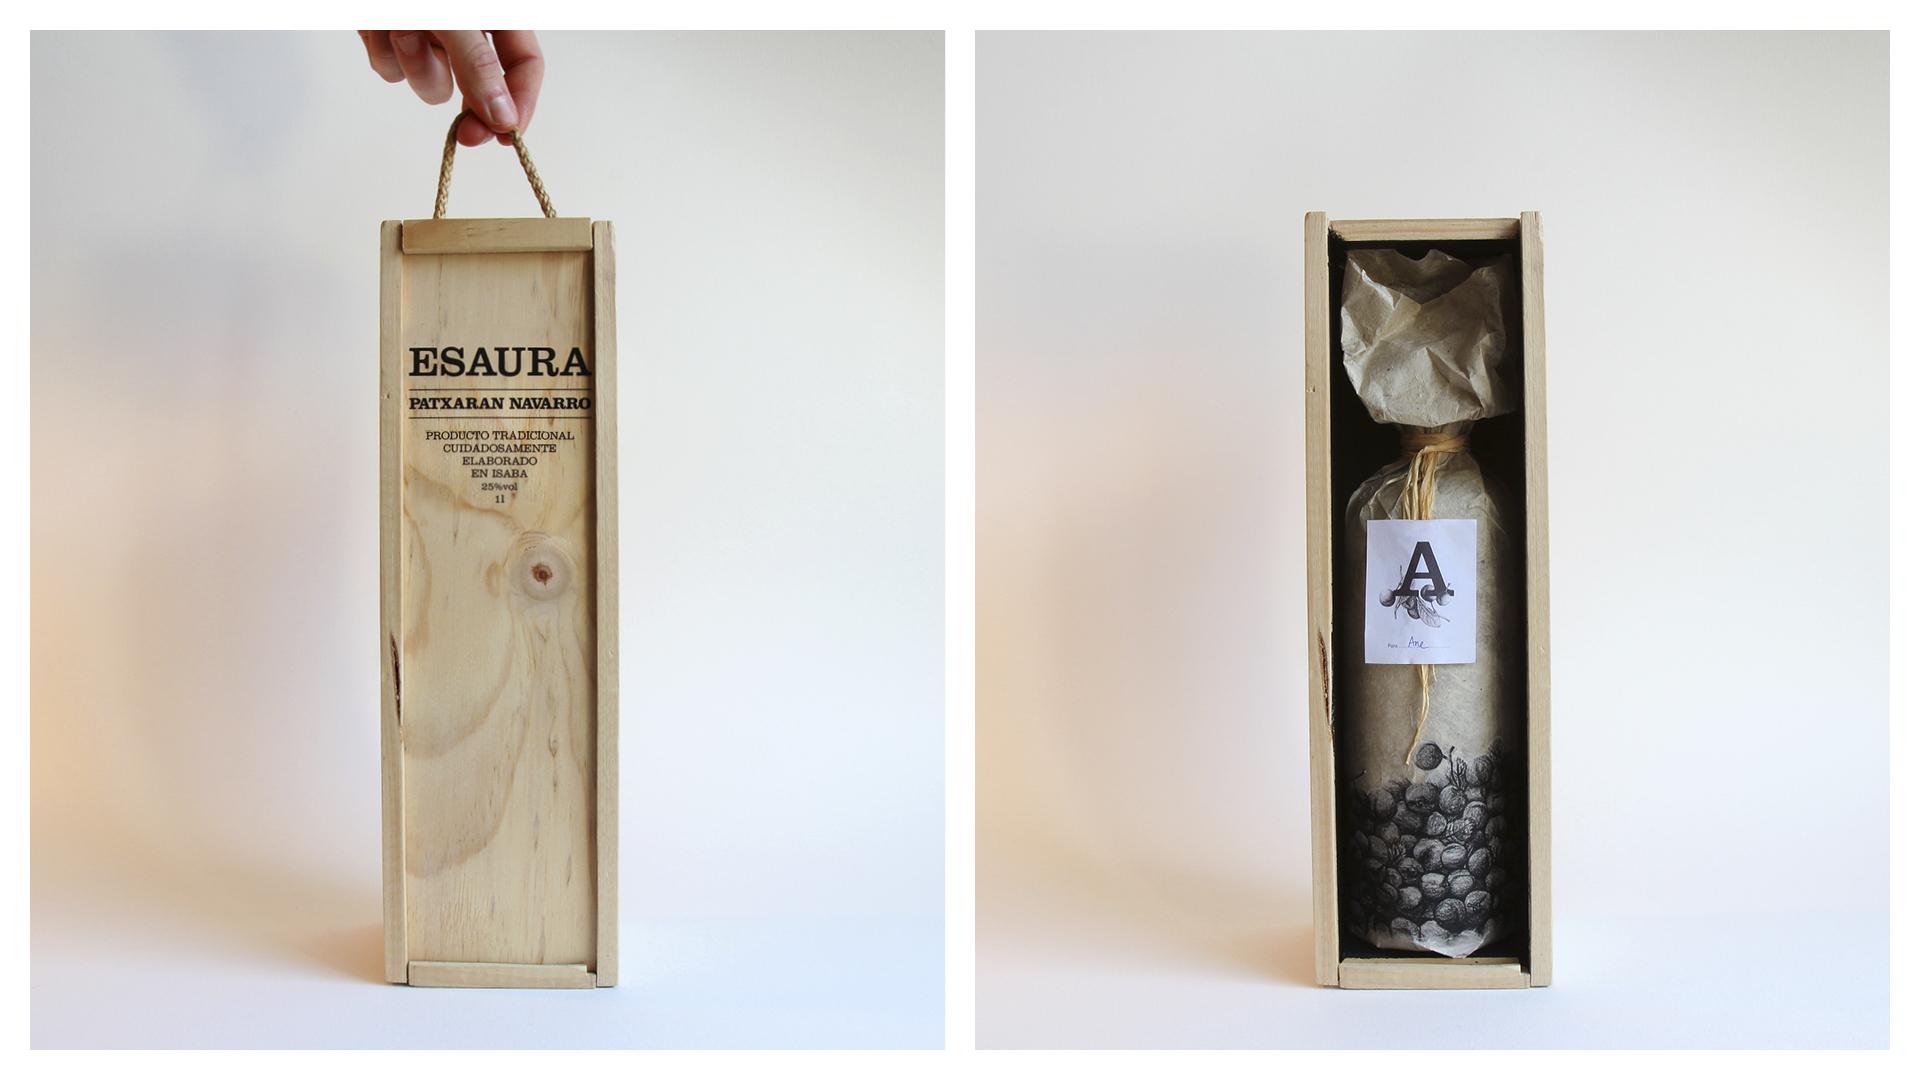 Diseño del packaging para Esaura Patxarana by Ibon Markaida Llorente - Creative Work